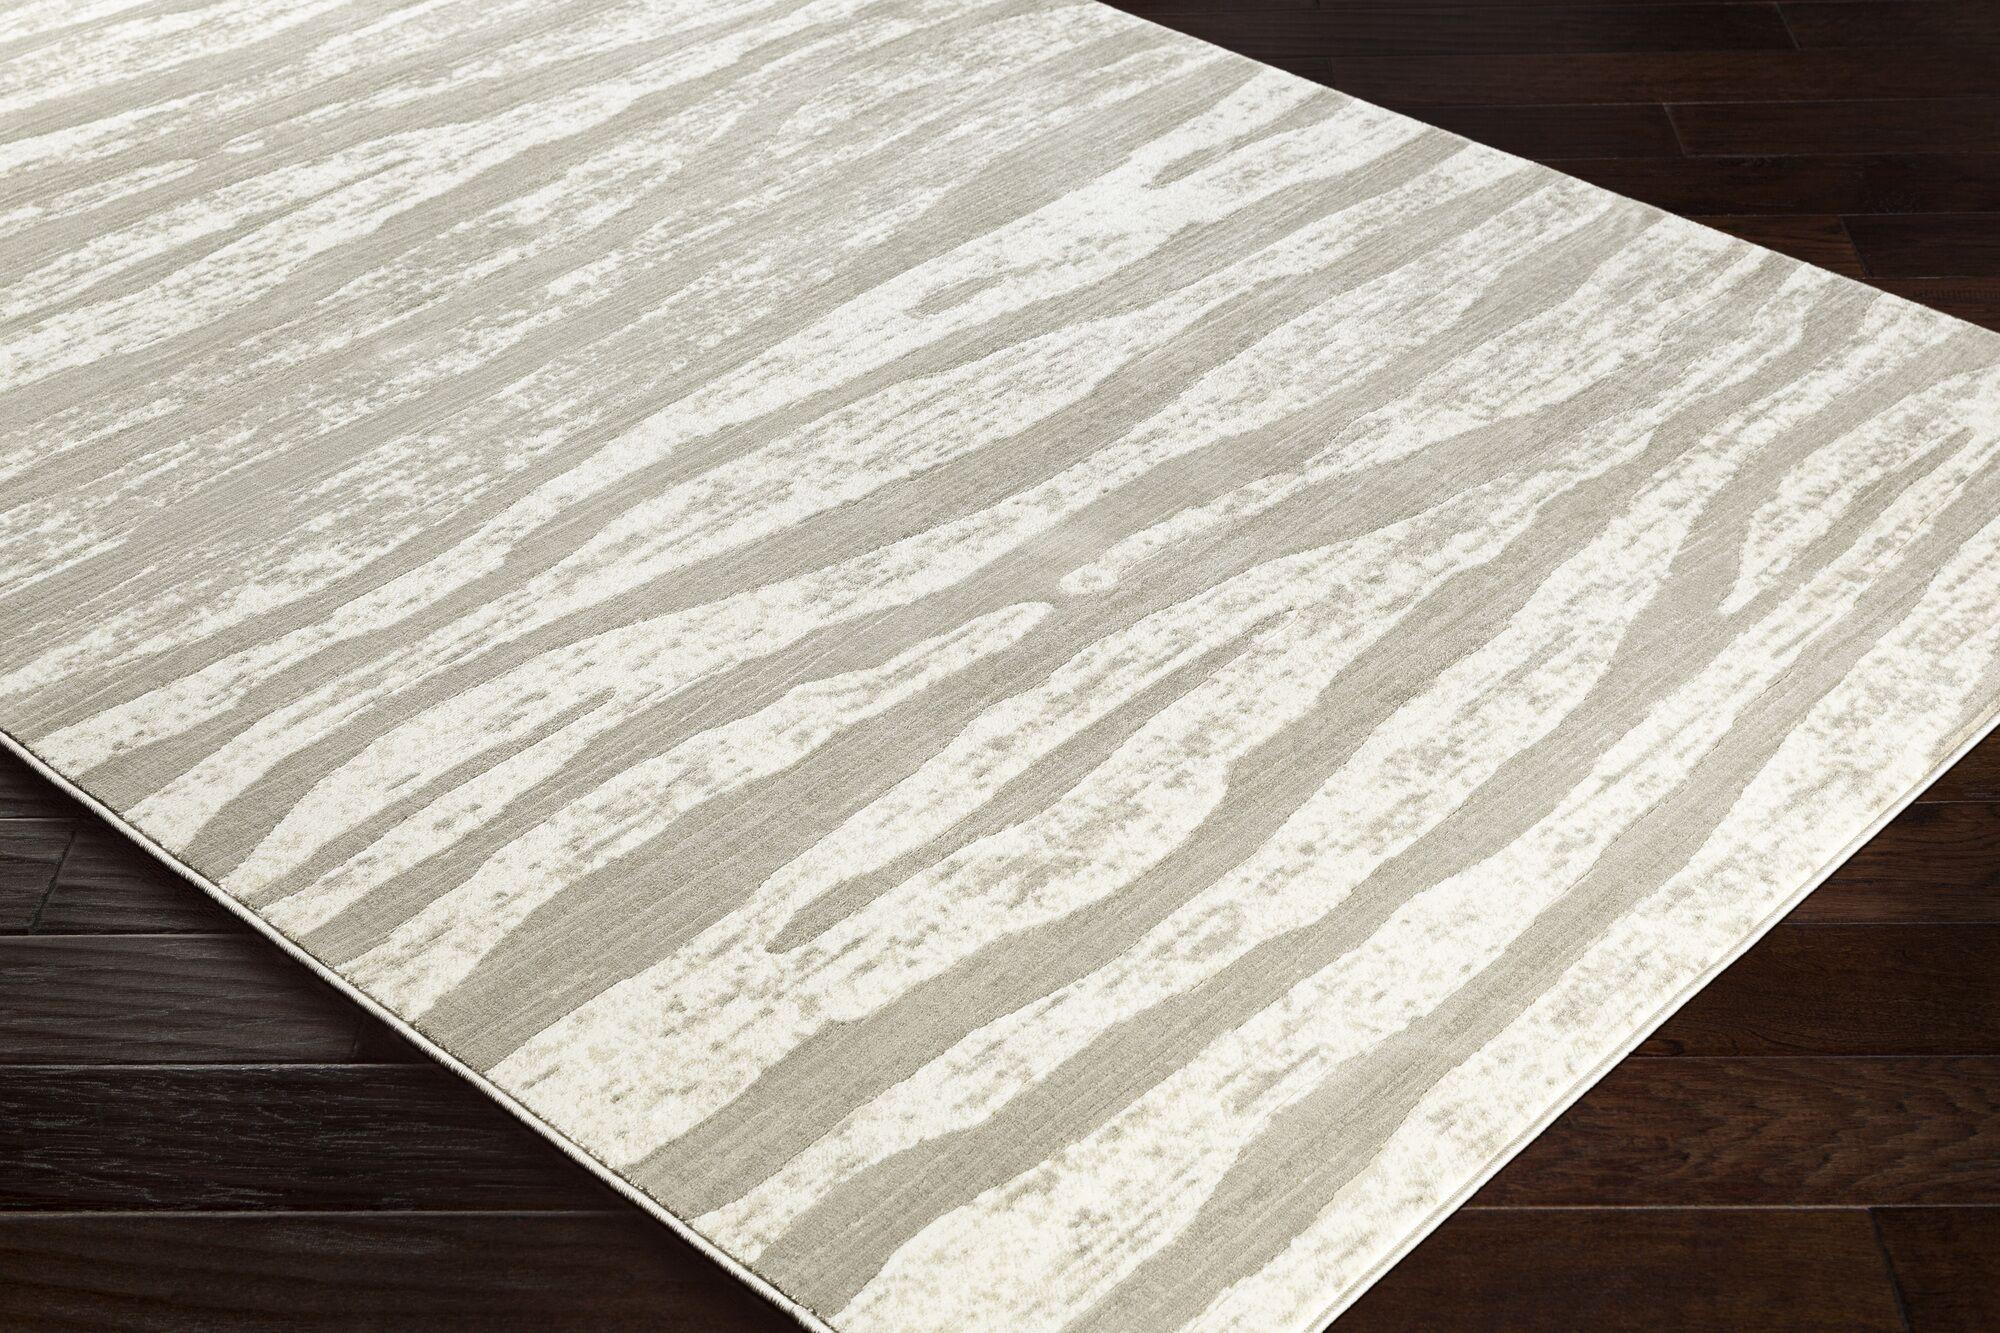 Nagel Light Gray/Taupe Area Rug Rug Size: Rectangle 5'2